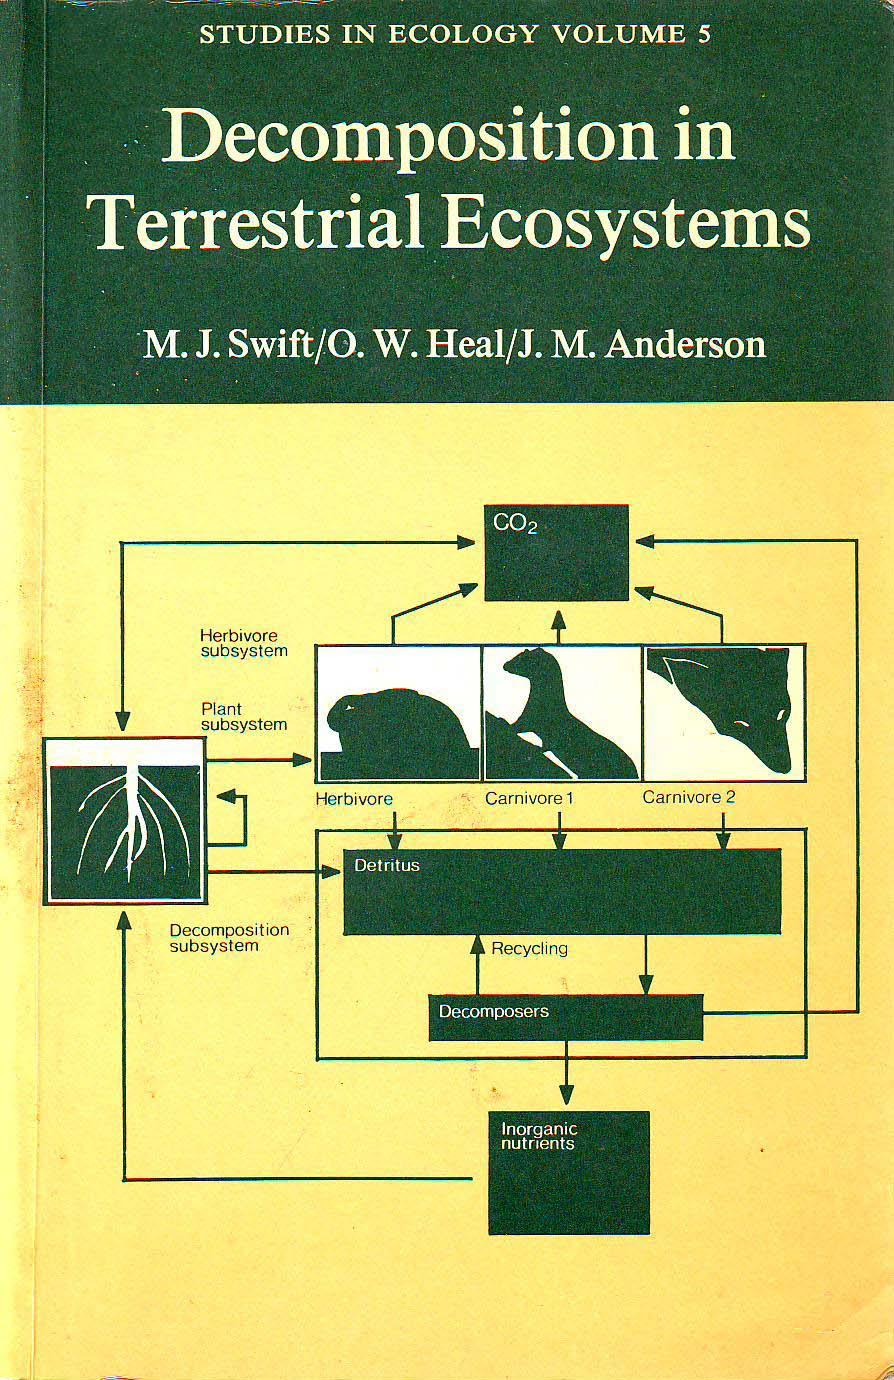 Decomposition in Terrestrial Ecosystems